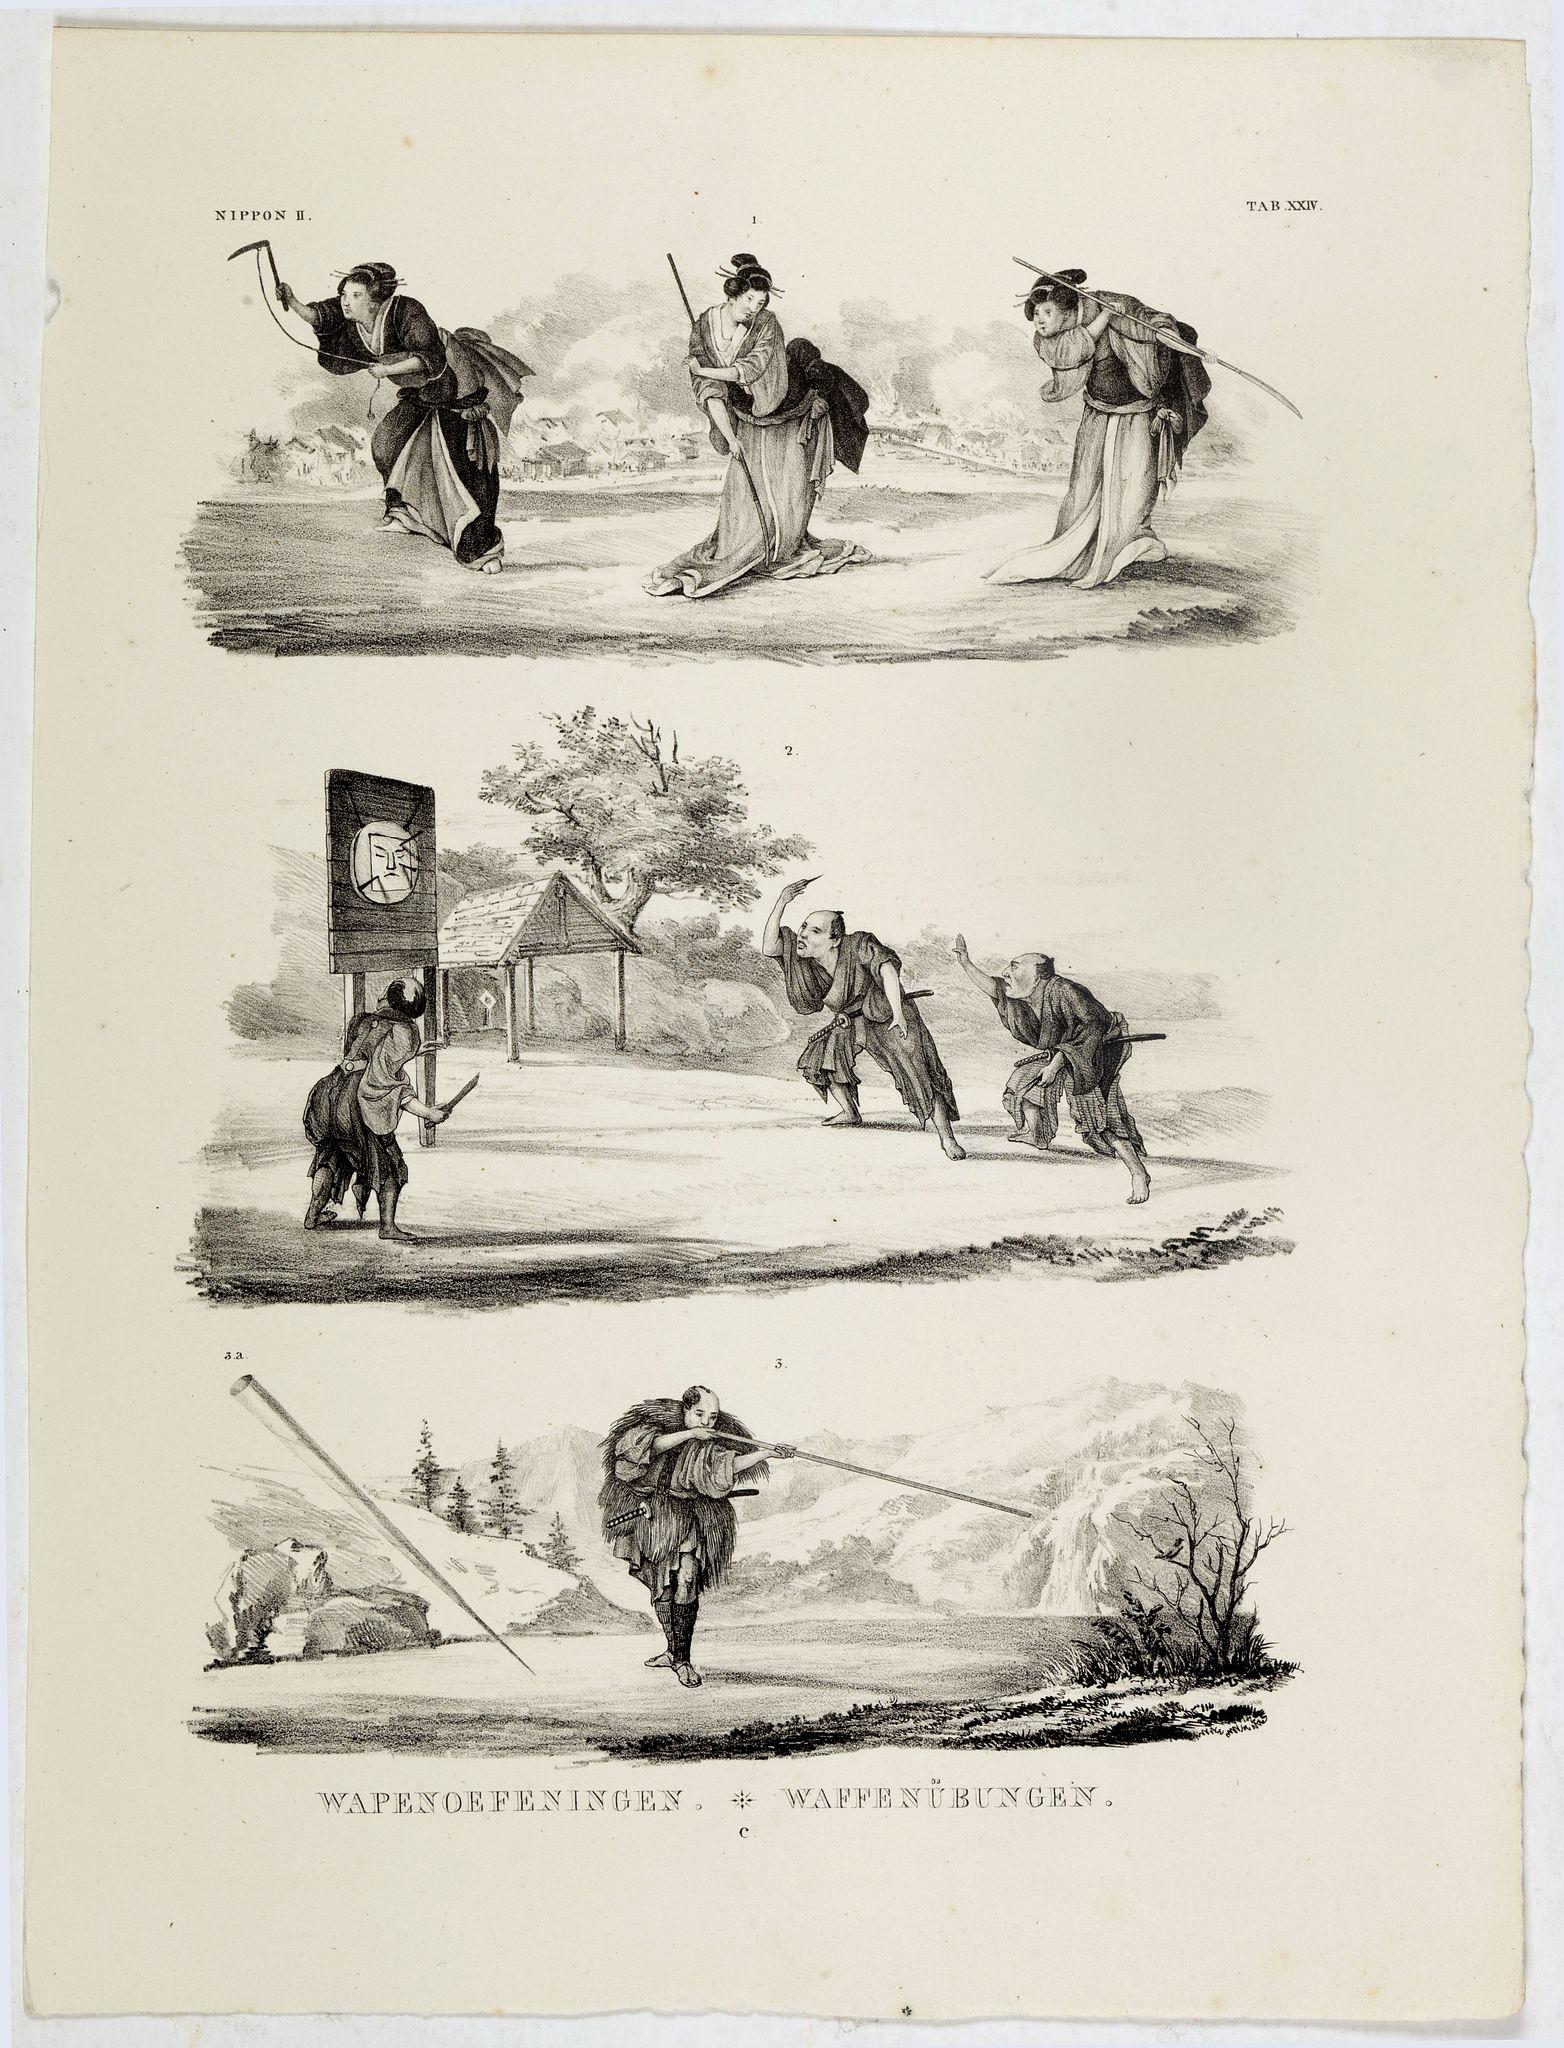 VON SIEBOLD, P.Fr.B. -  Wapenoefeningen - Tab XXIV. (Japanese martial art techniques)